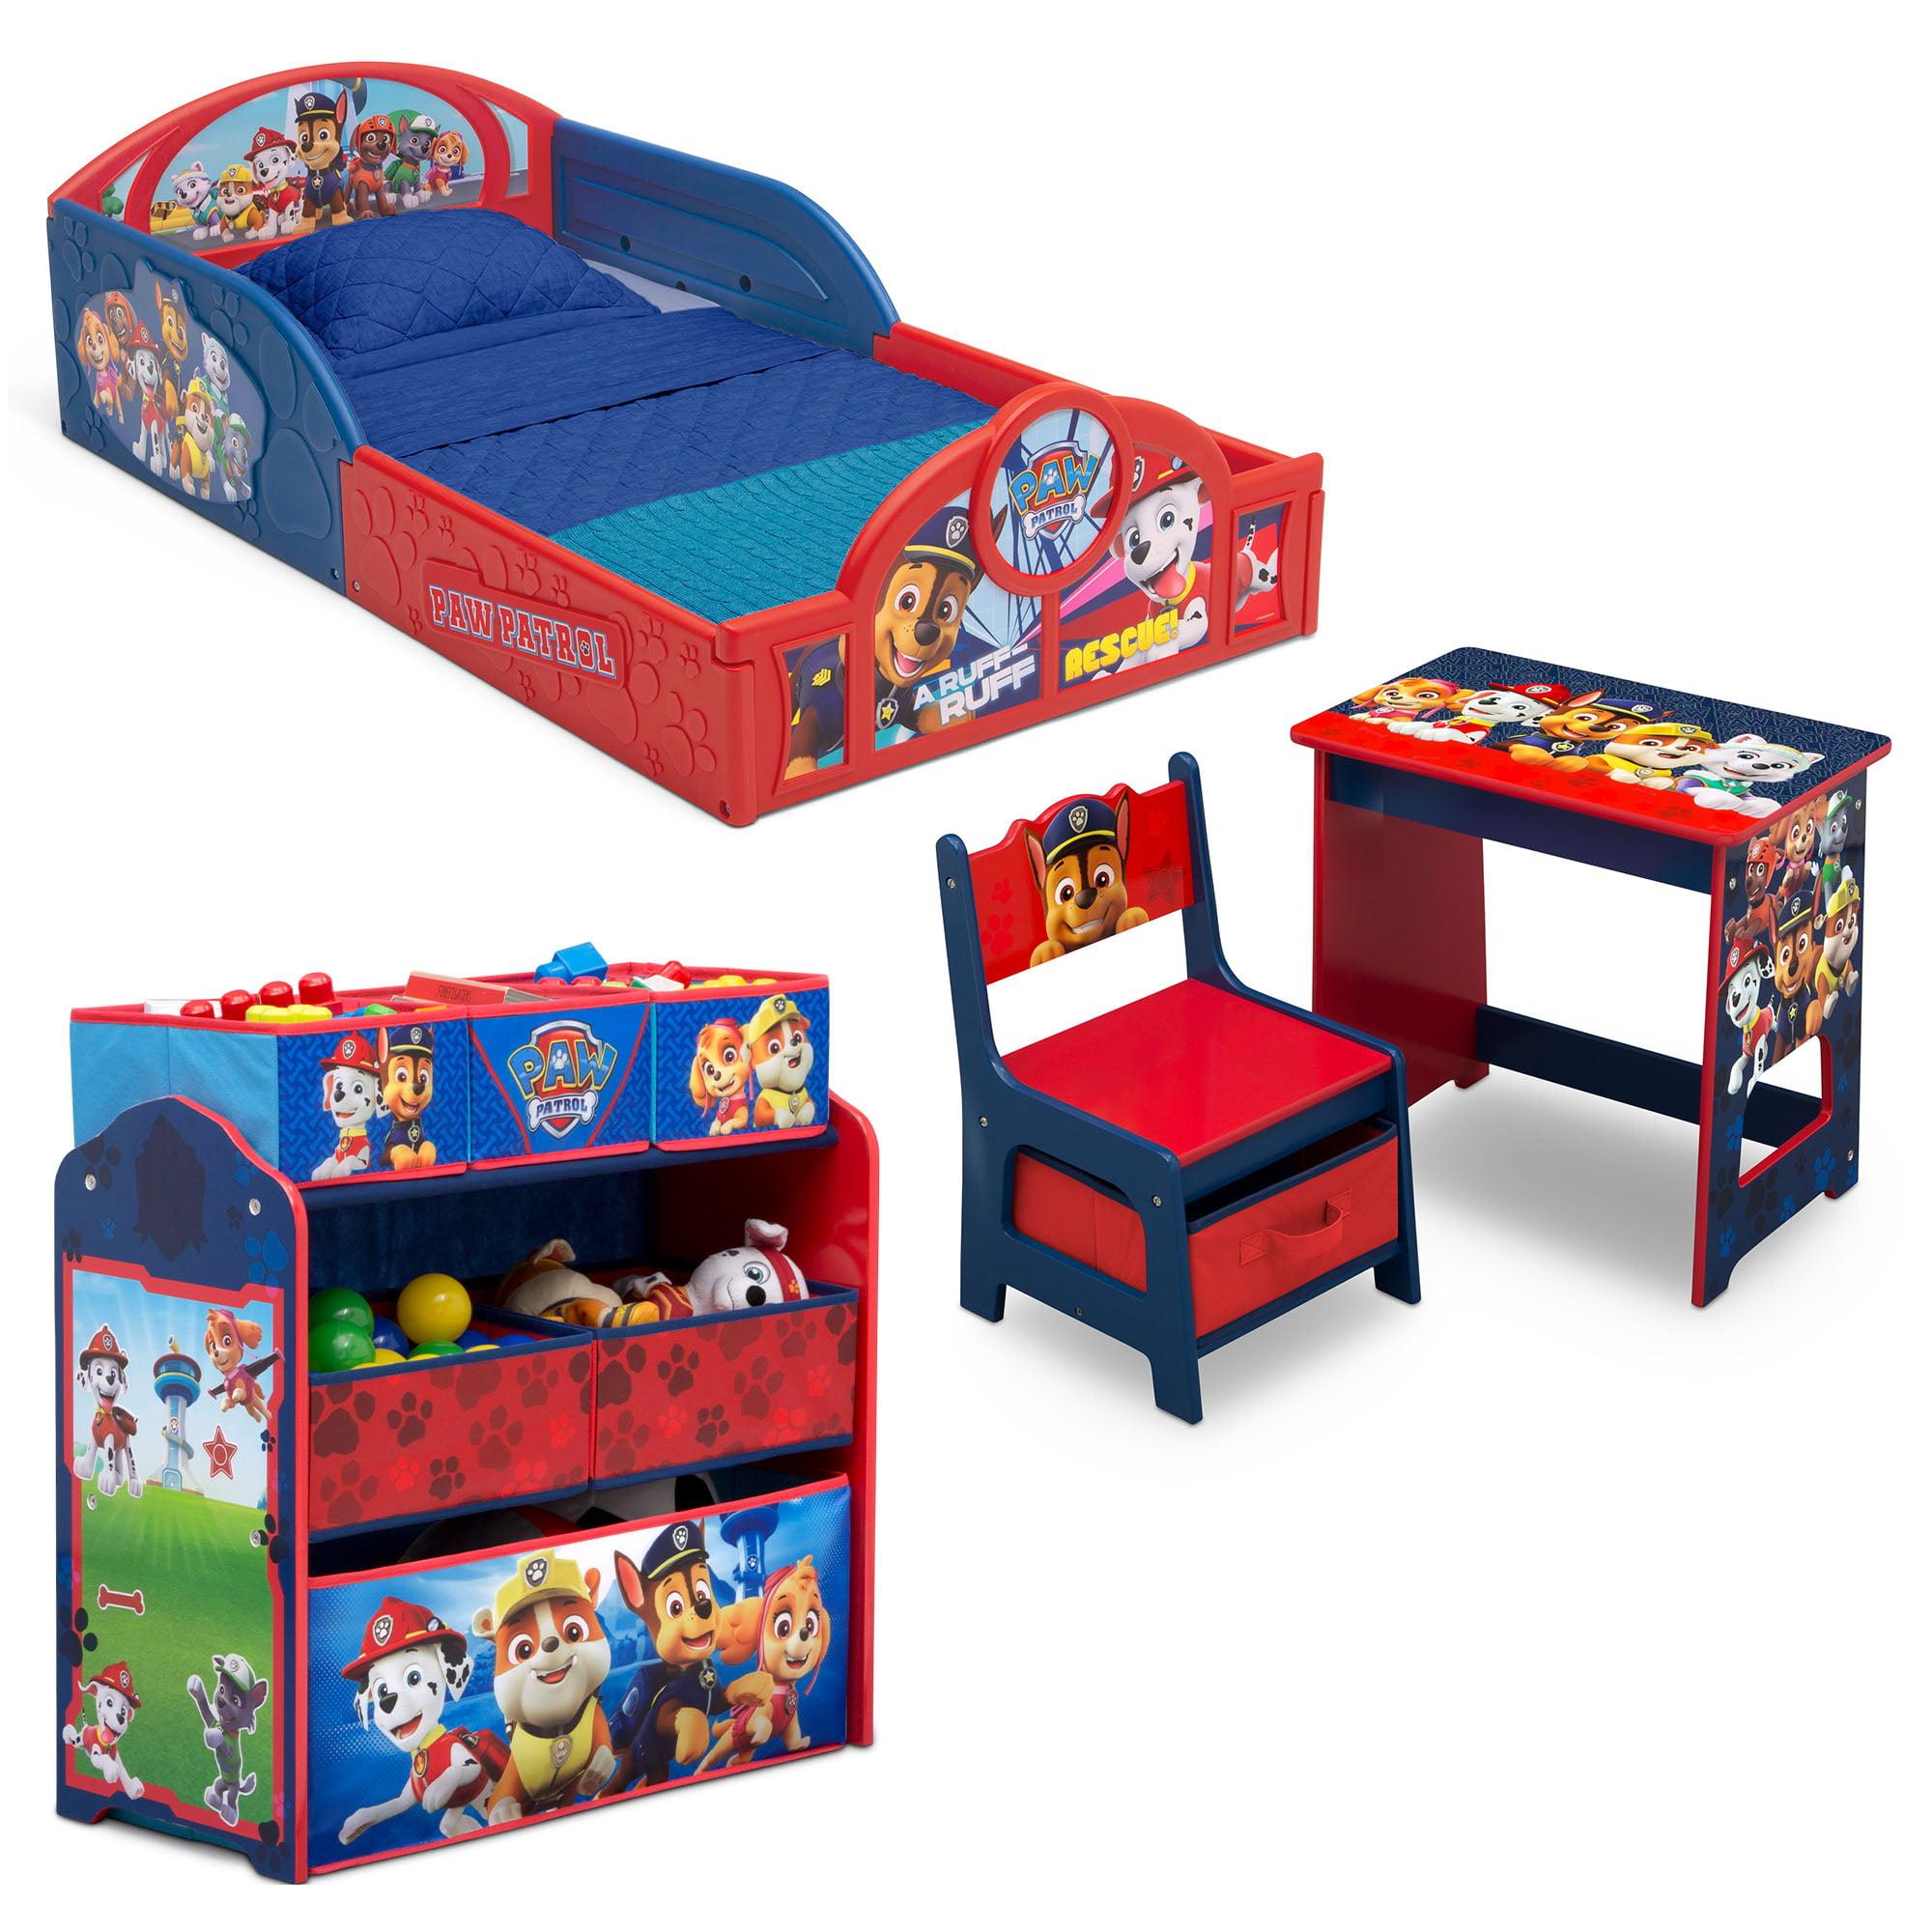 Nick Jr. PAW Patrol 4-Piece Room-in-a-Box Bedroom Set by Delta